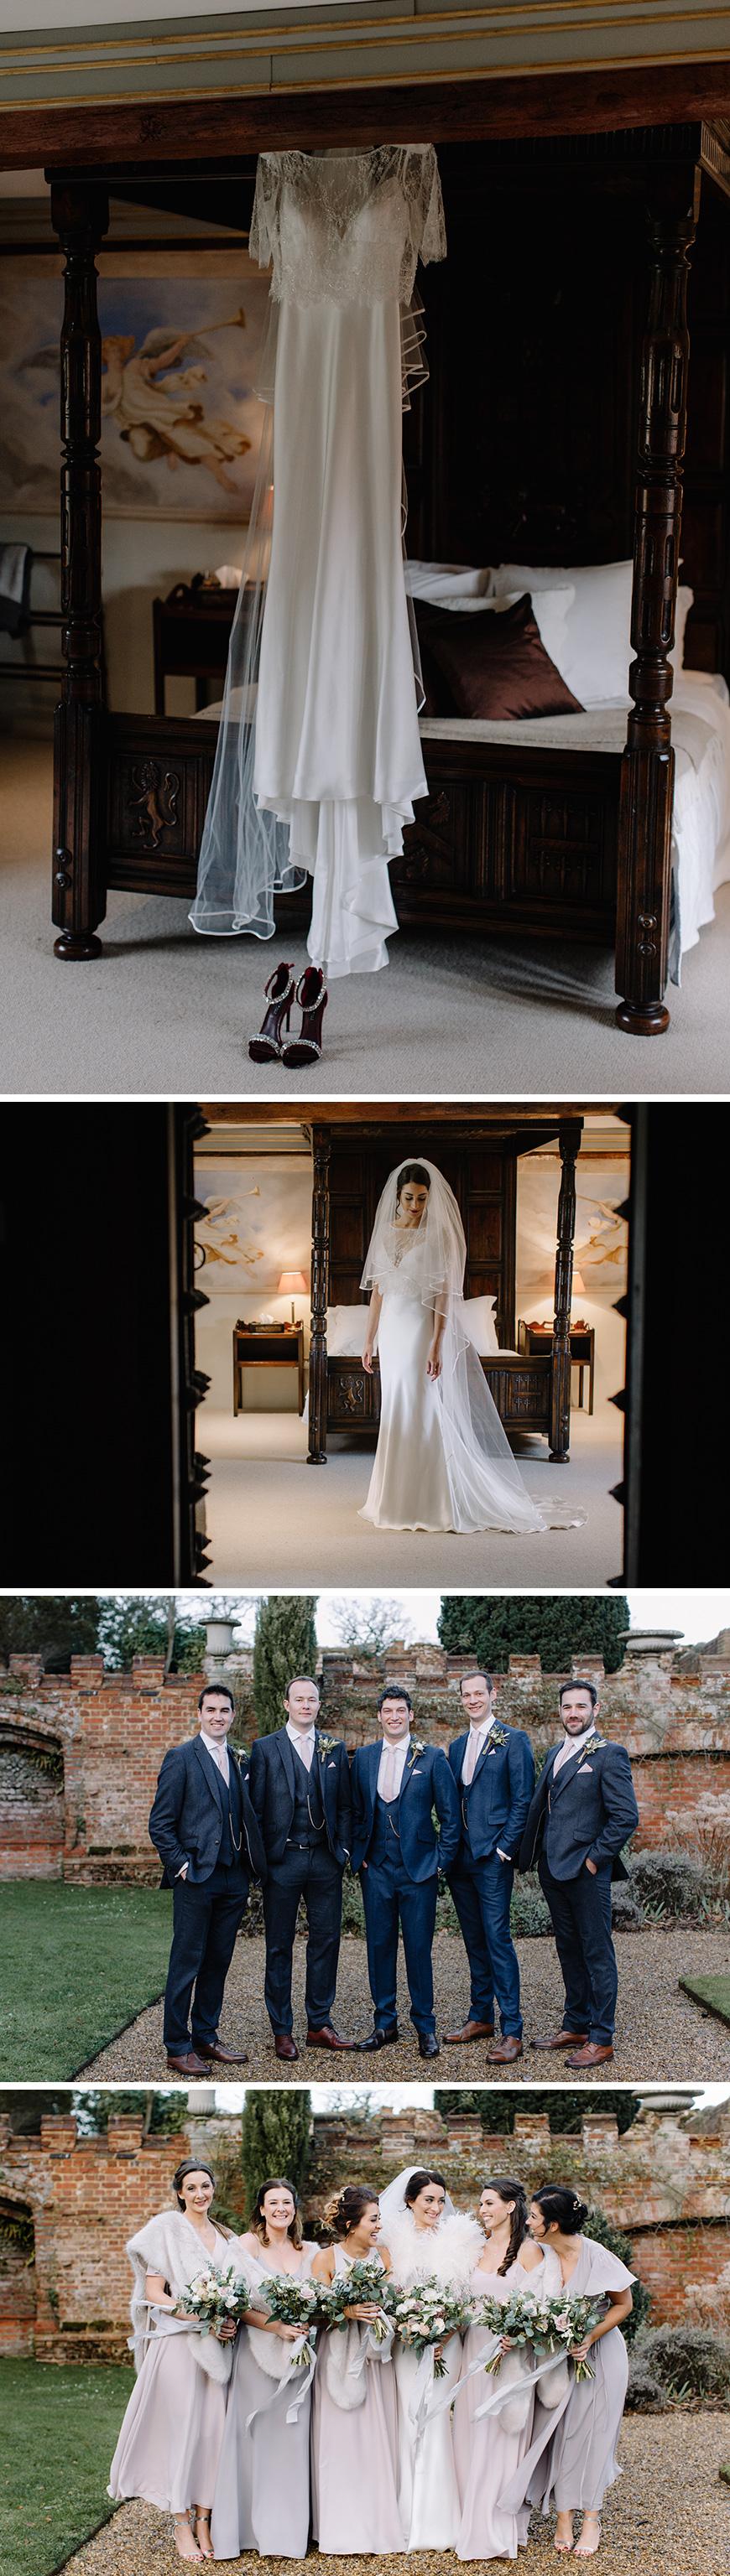 Real Wedding - Charlotte and Gareth's Romantic Winter Wedding at Oxnead Hall | CHWV